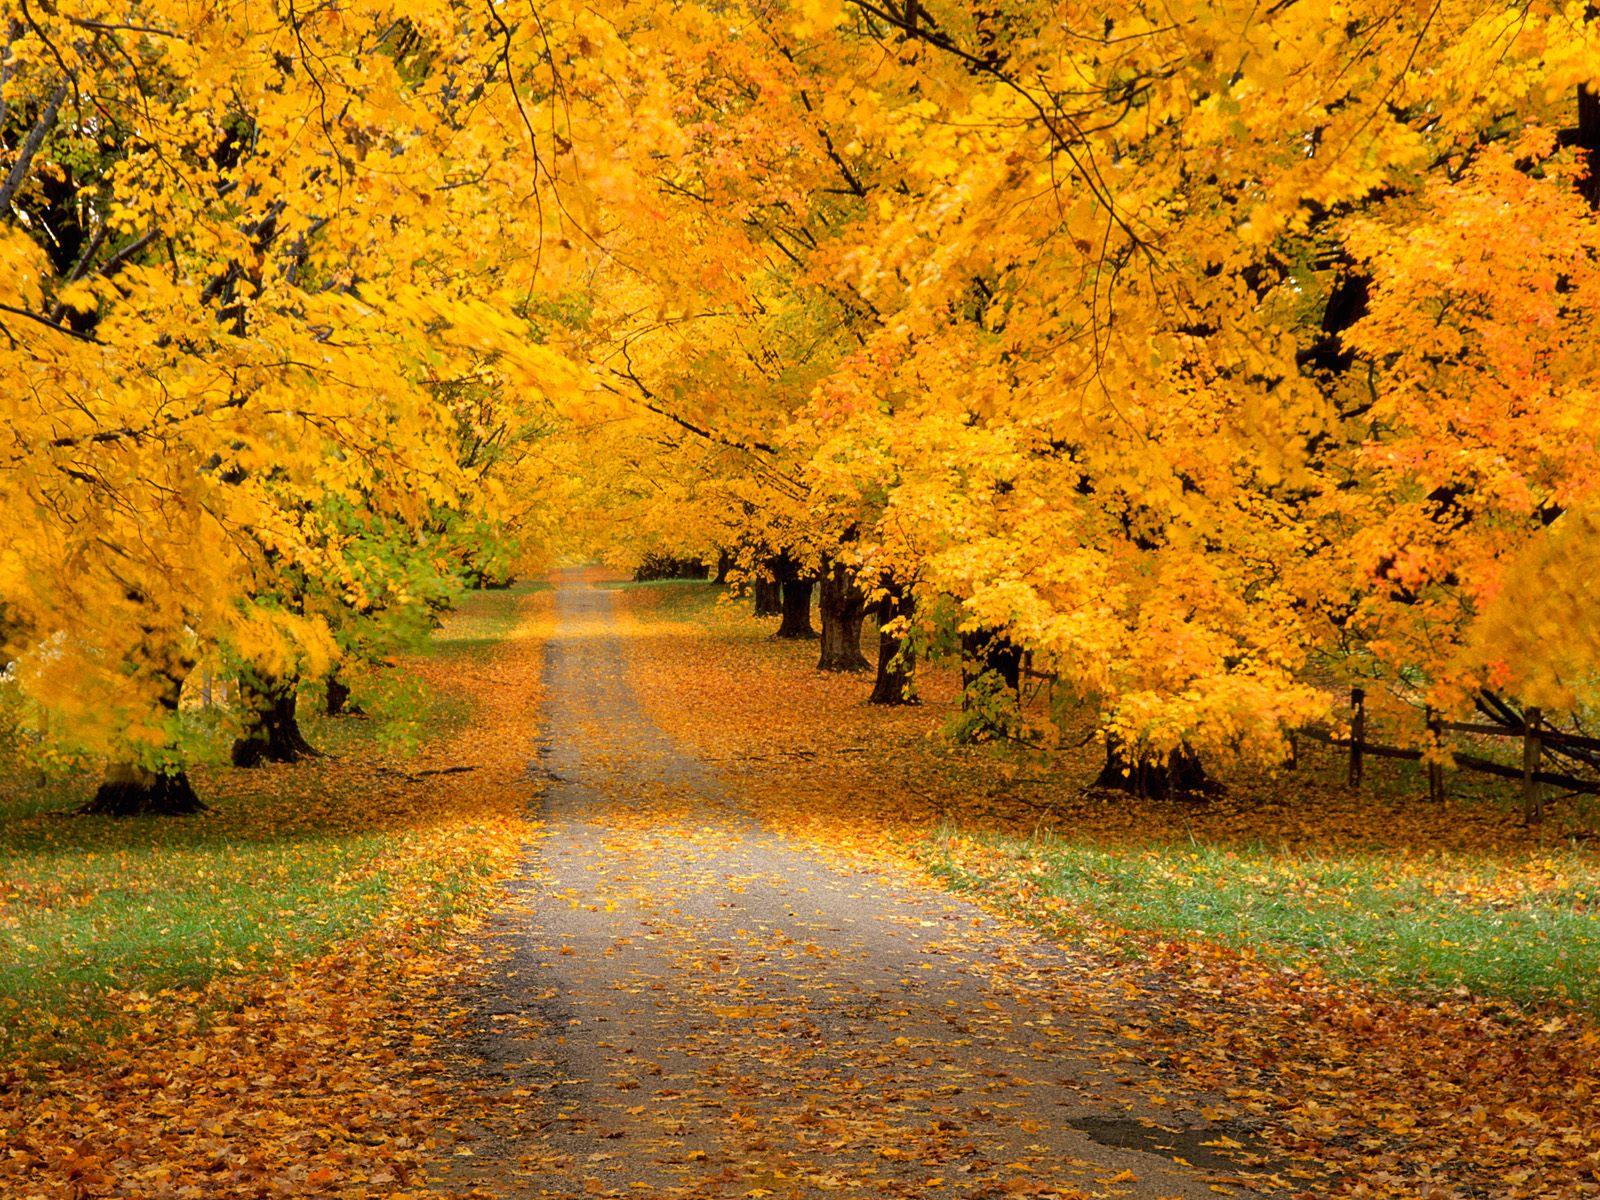 Beautiful Autumn Season Wallpapers HD Nice Wallpapers 1600x1200